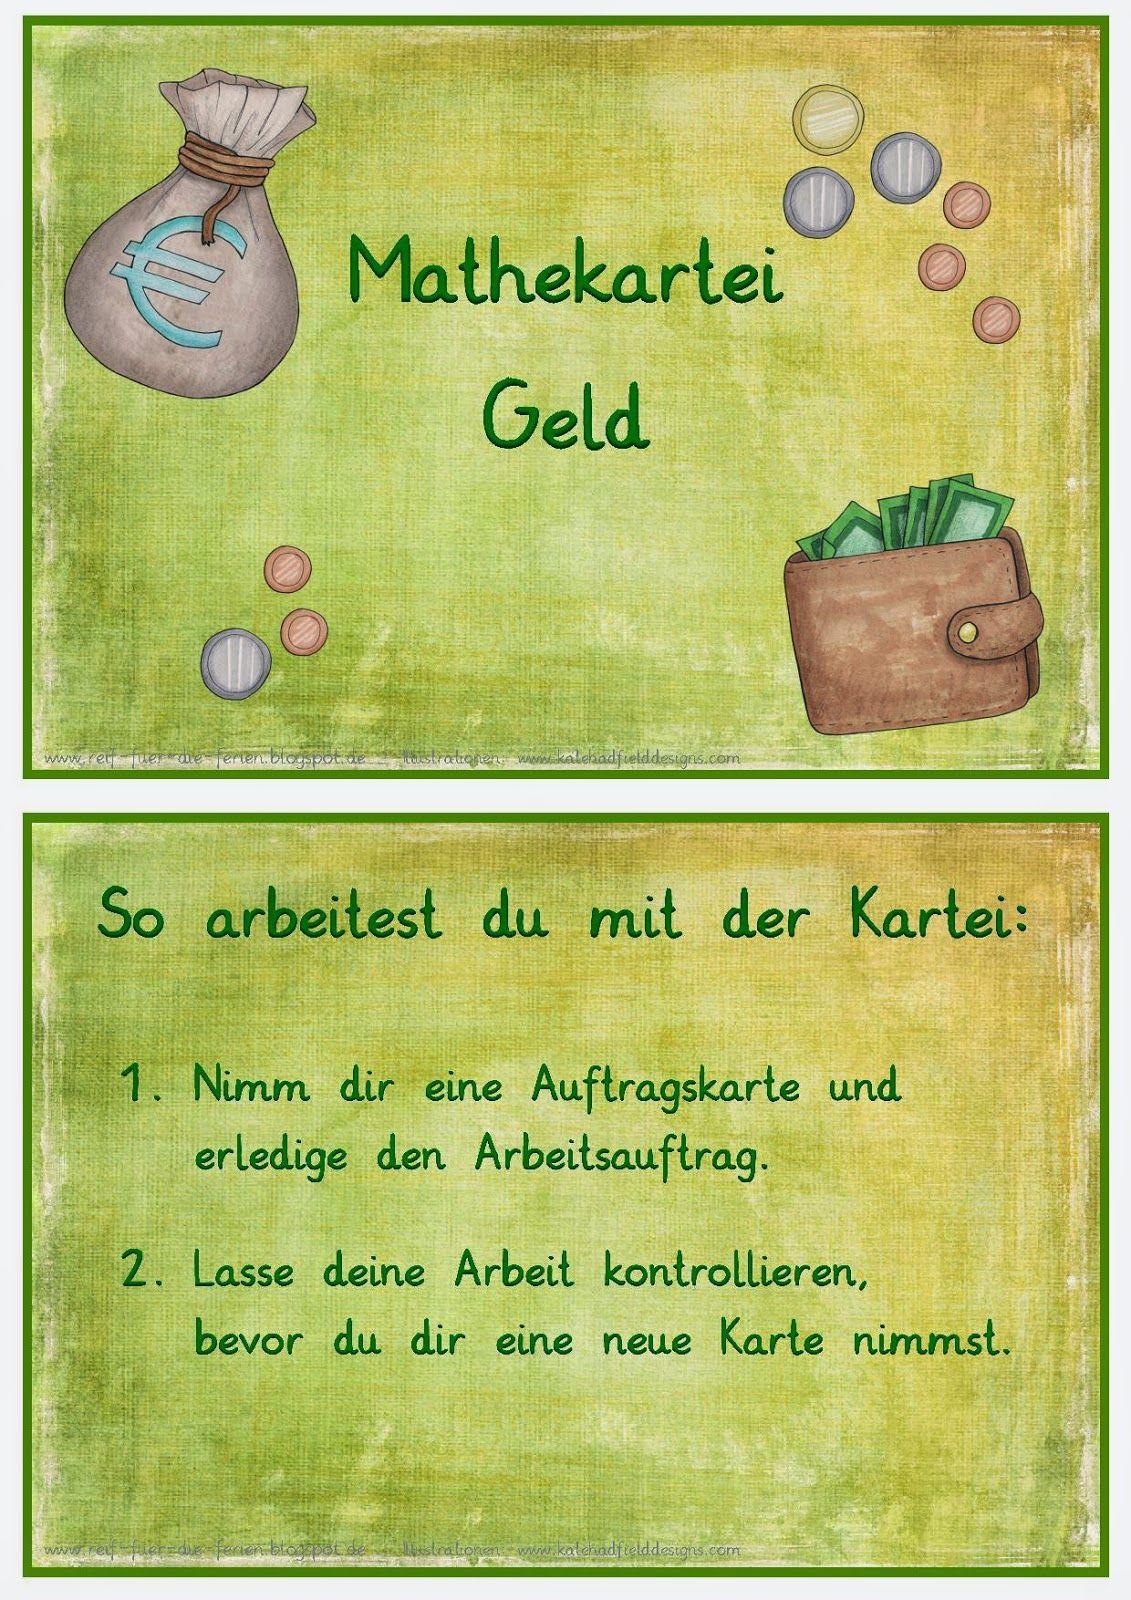 Mathe Kartei Geld